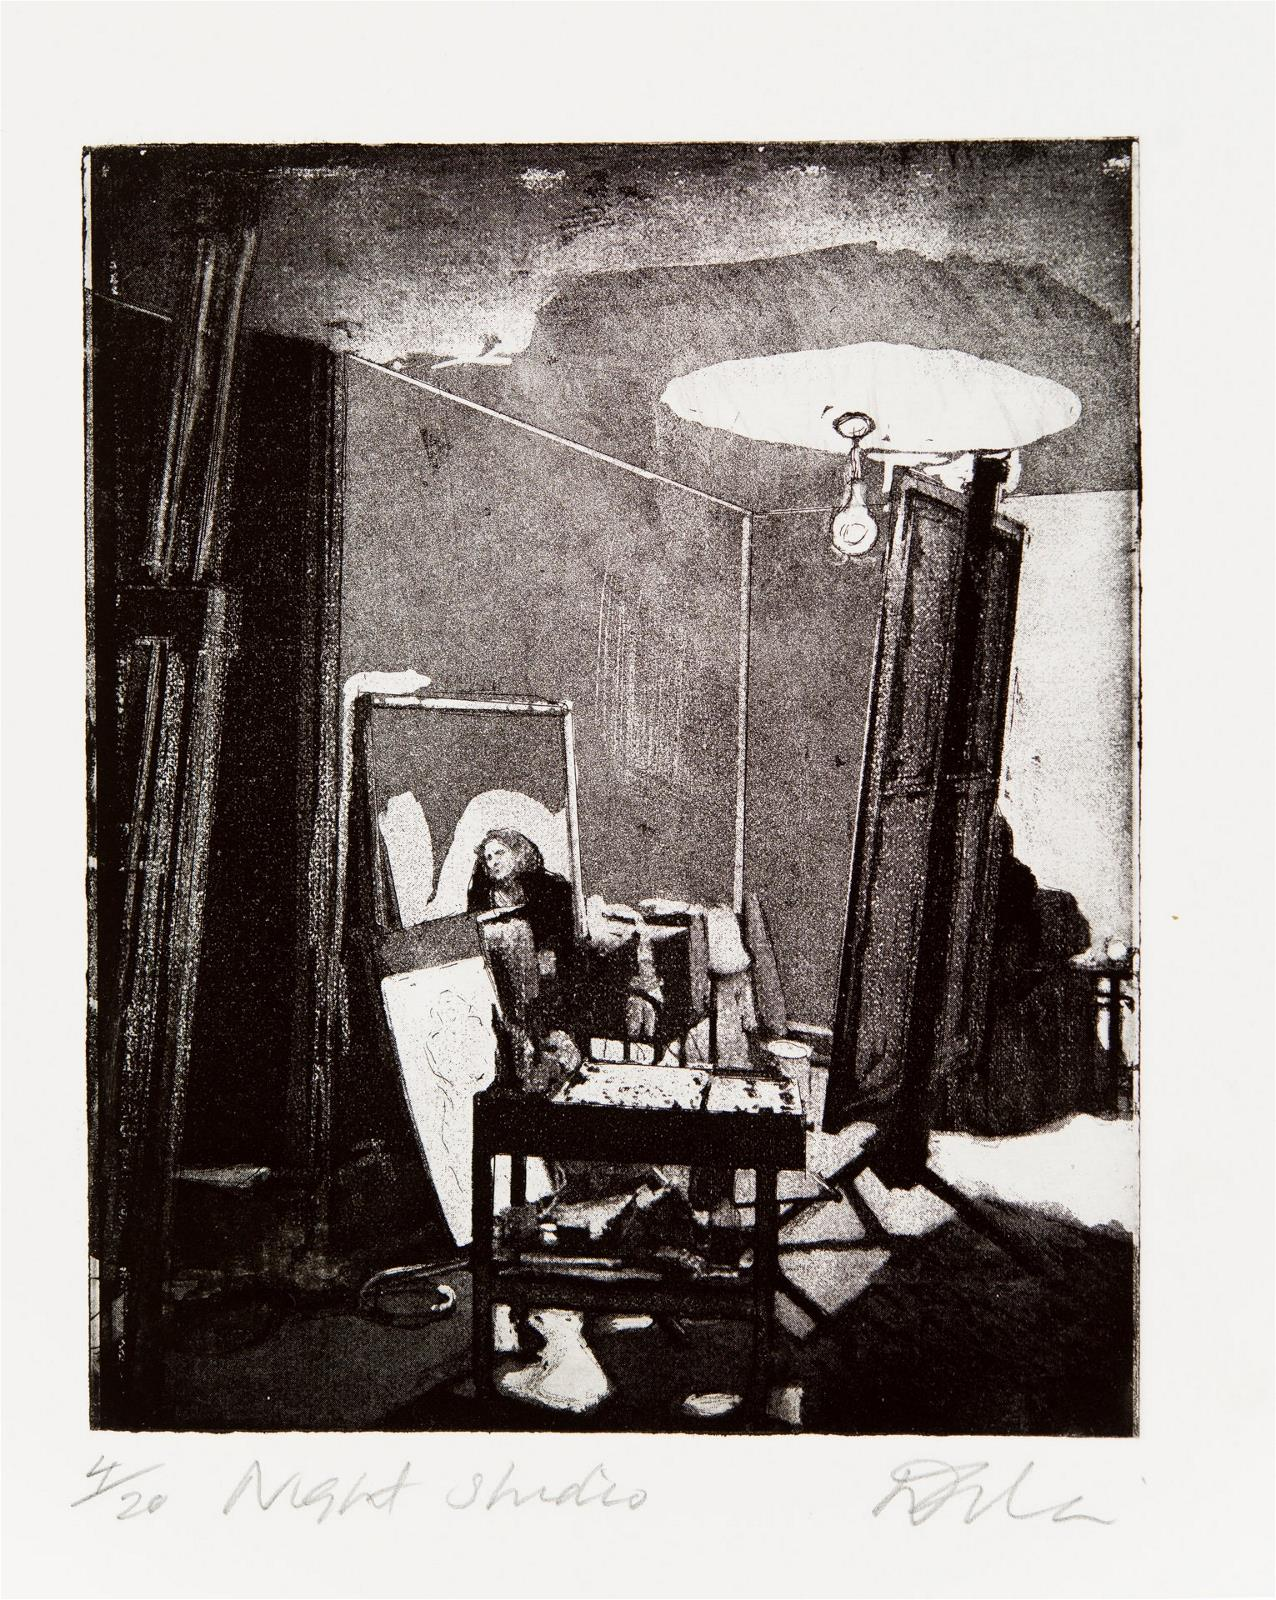 Night Studio